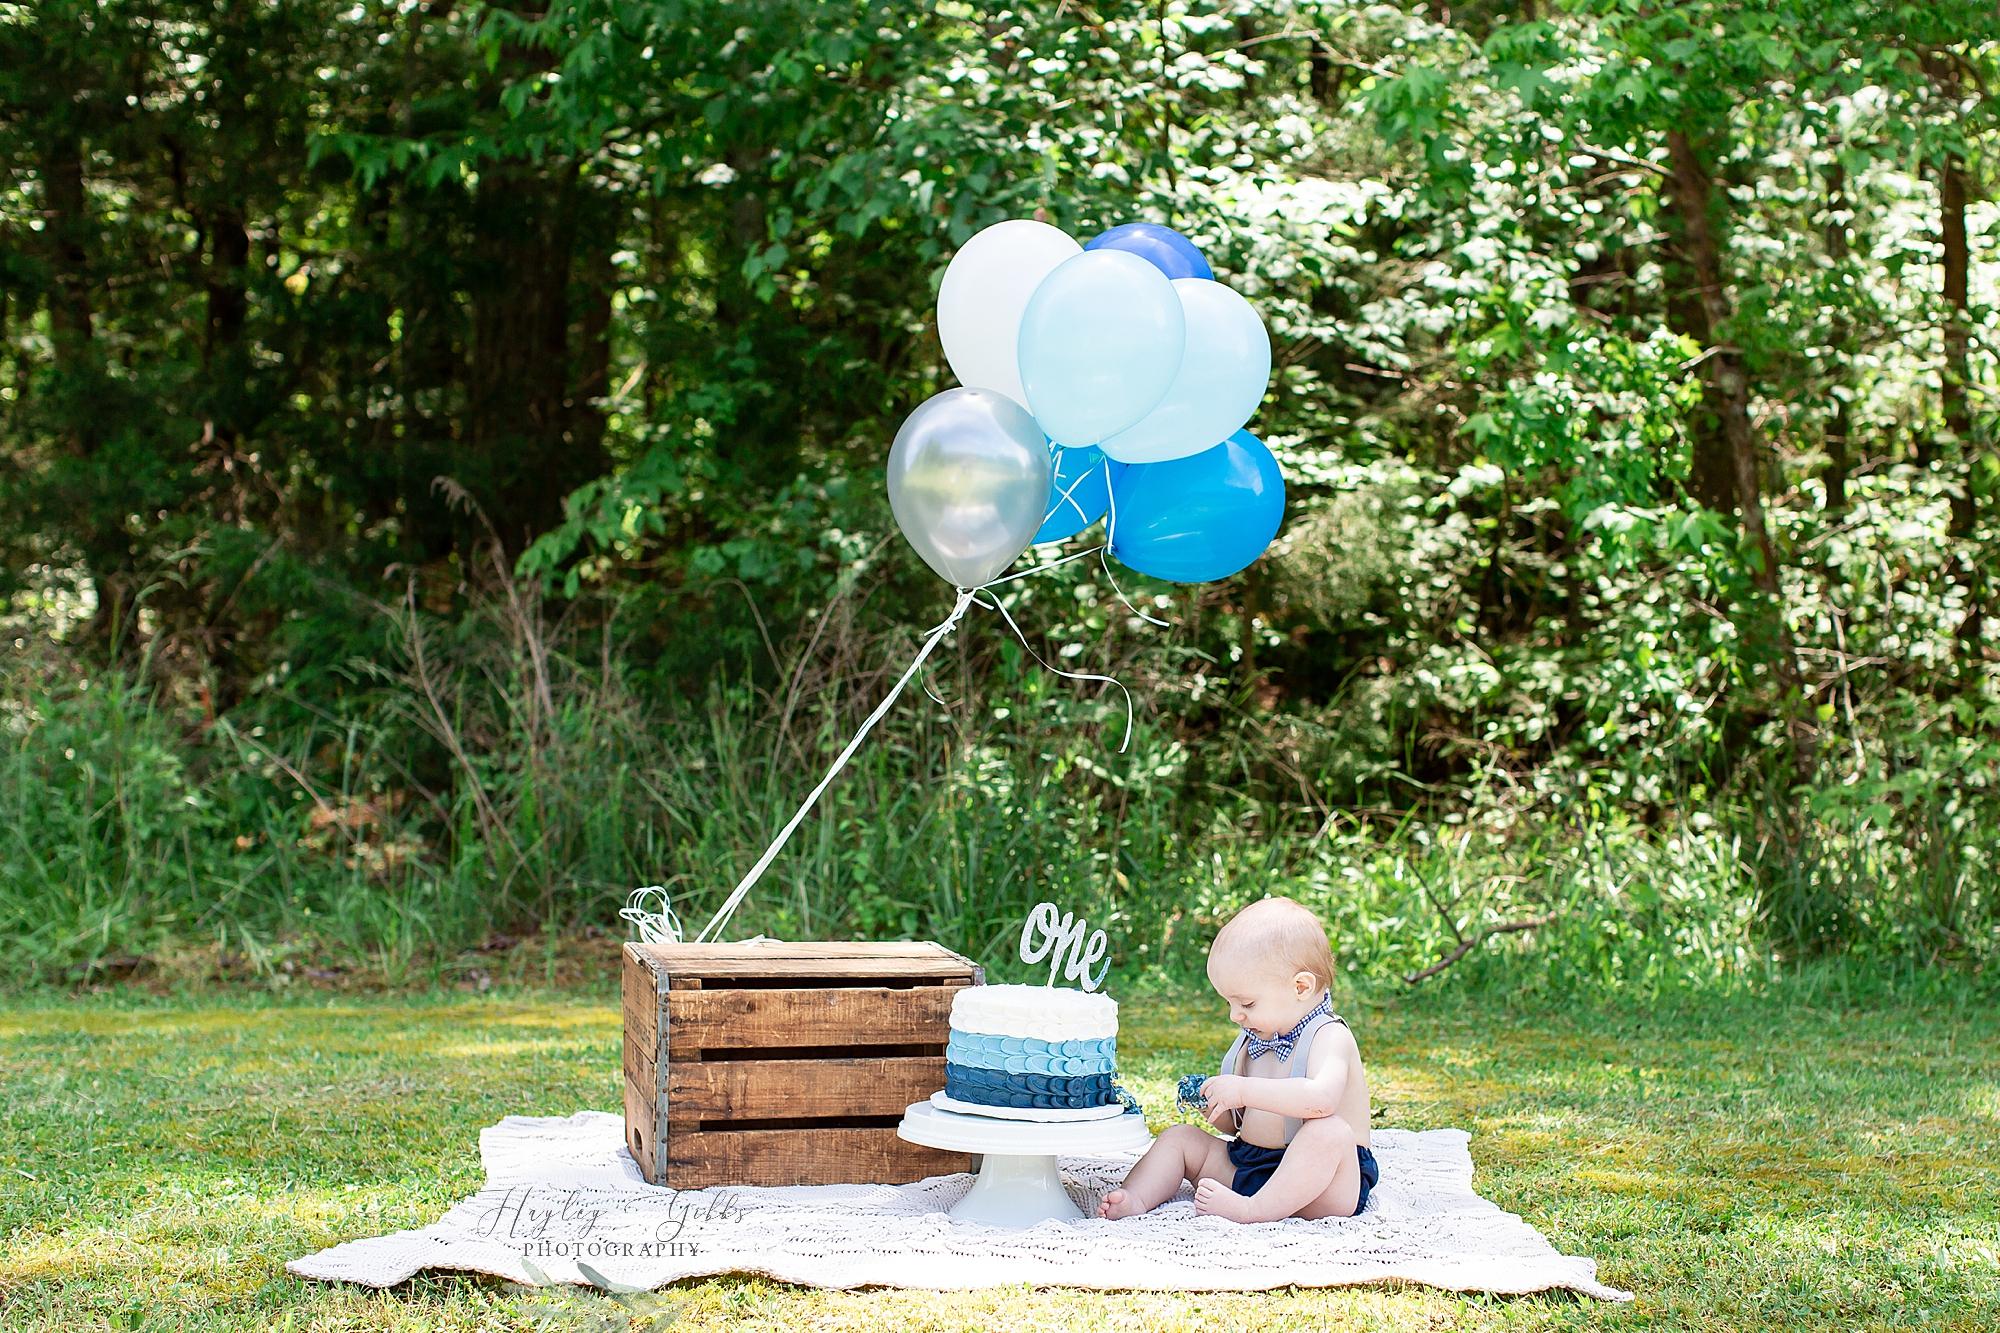 Hayley Gibbs Photography, Snead Alabama Photographer, Newborn Photographer, Oneonta Alabama Newborn Photographer, Oneonta Alabama Photographer, Newborn Photography, Snead Alabama, Professional Newborn Photography, Best Newborn Photographer, First Birthday Photography